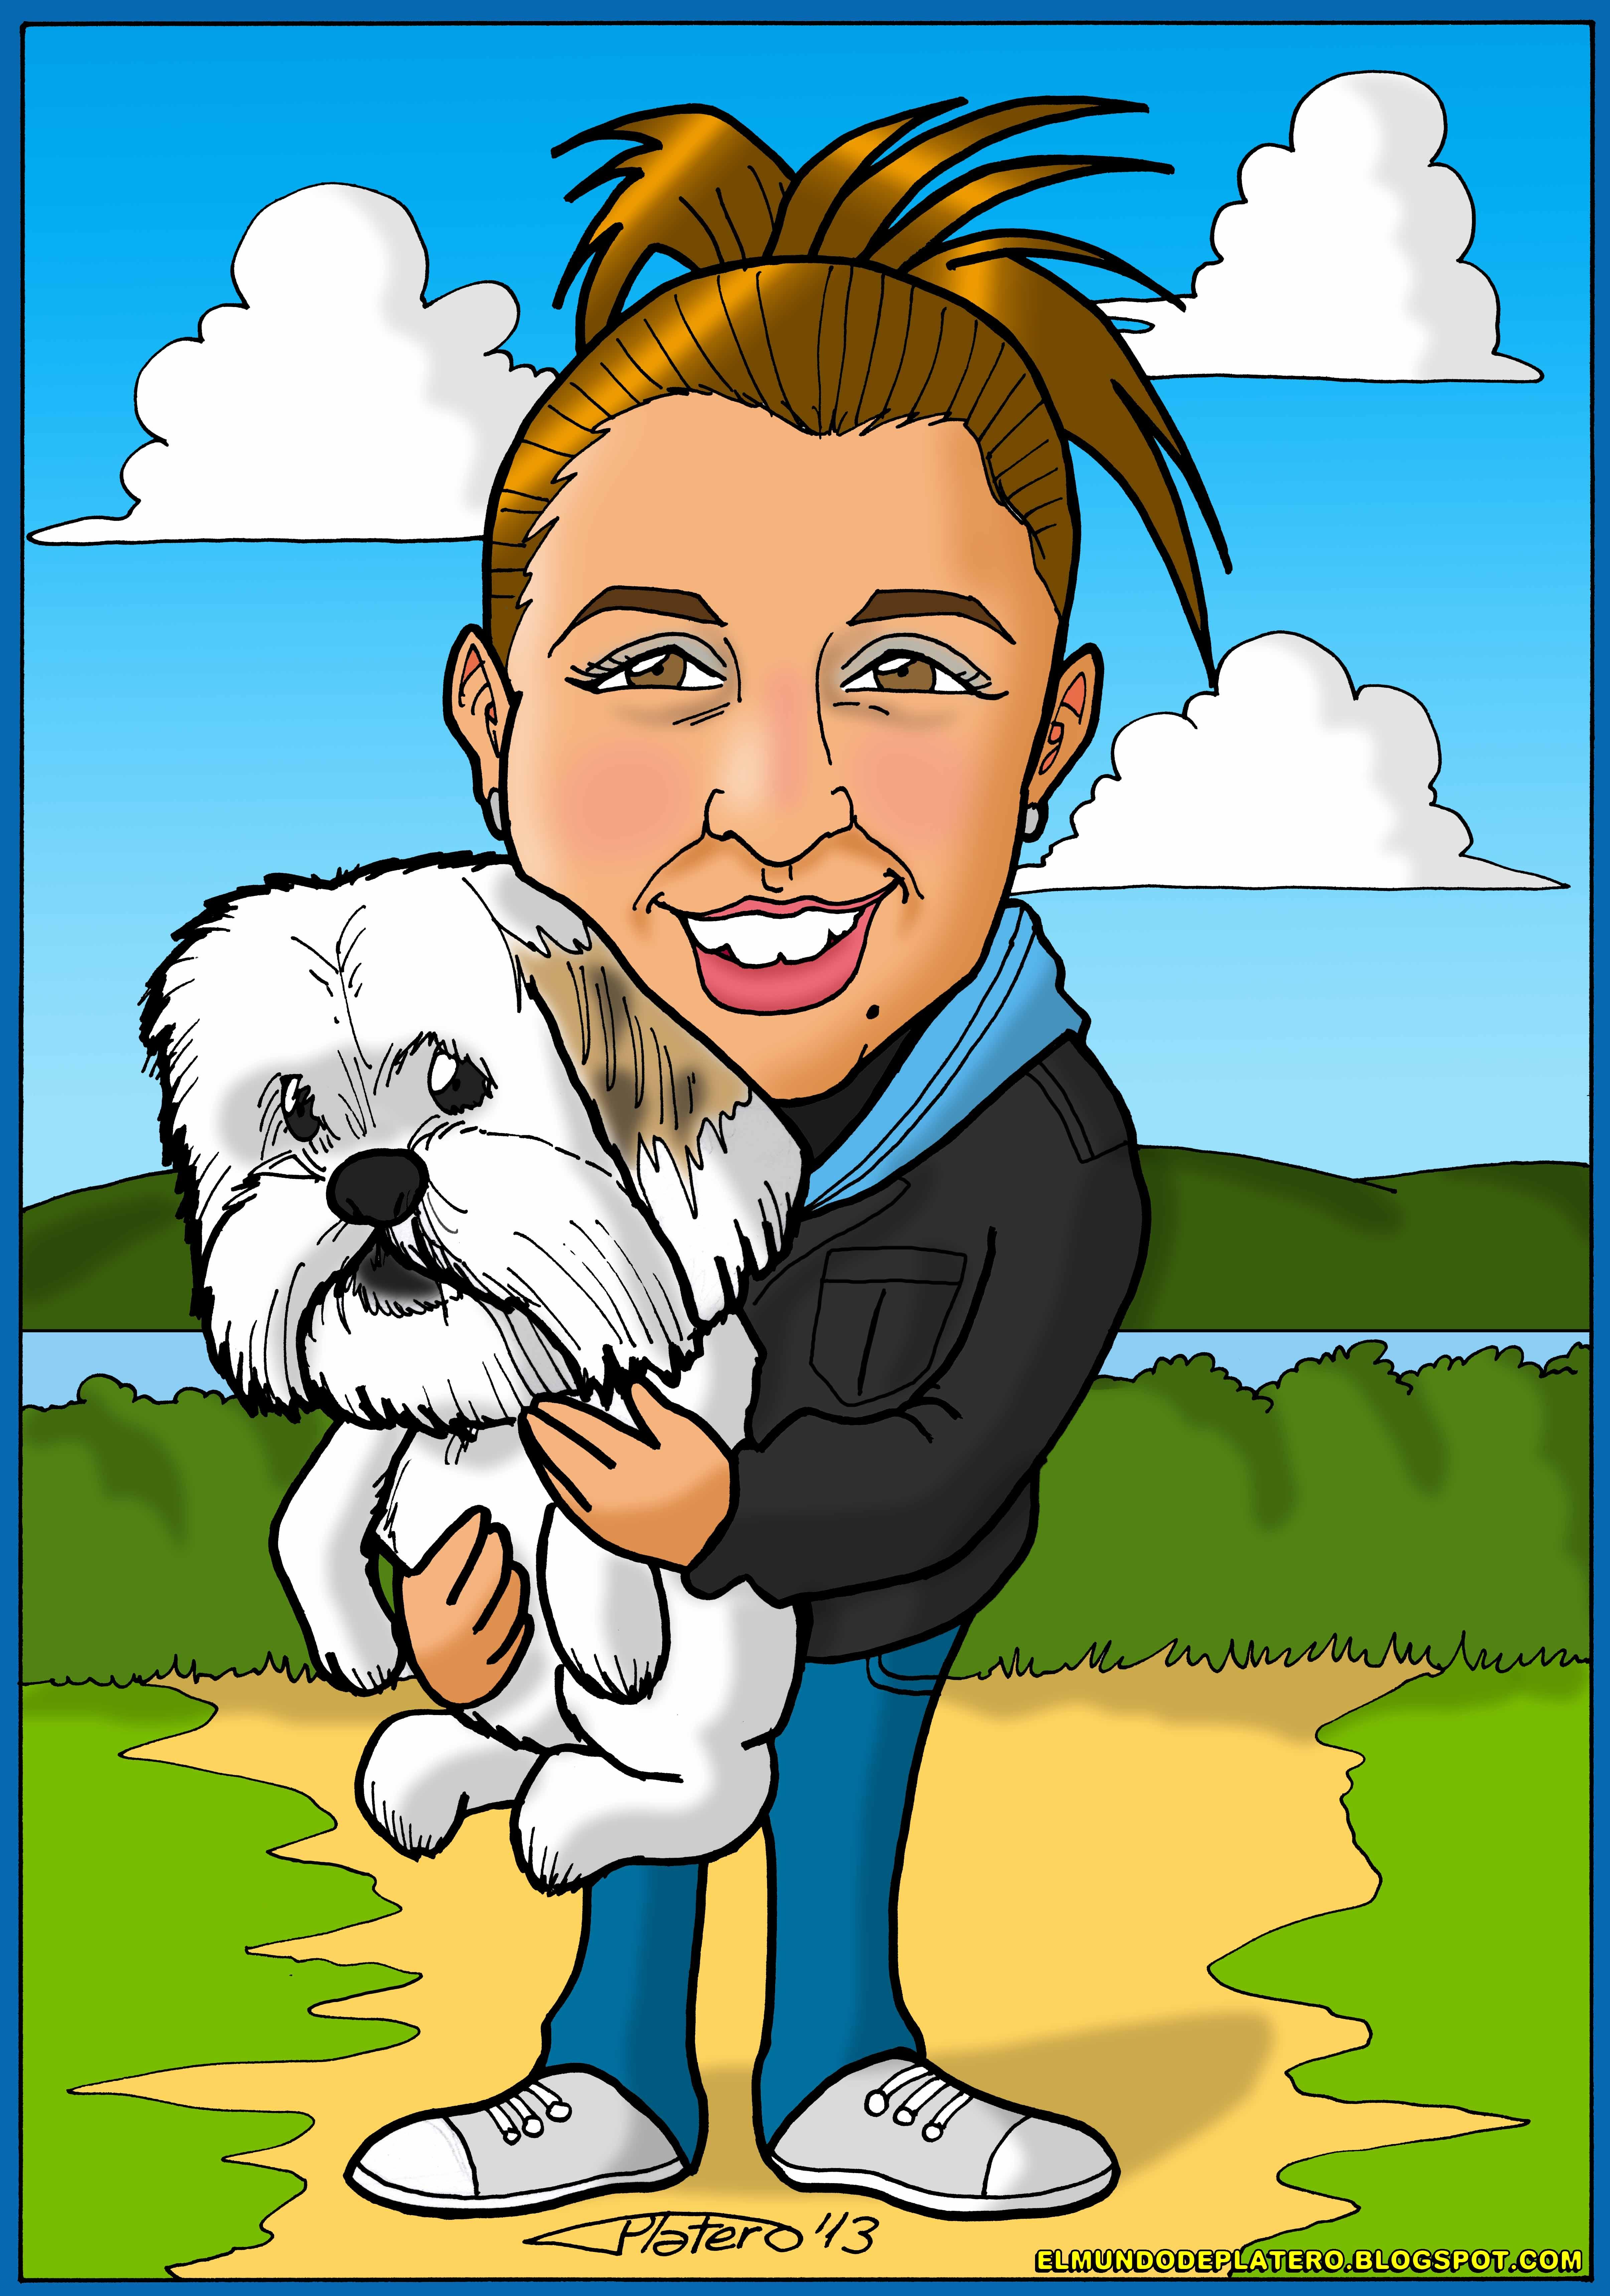 caricaturas a color por encargo personalizadas_chica con perro_elmundodeplatero_